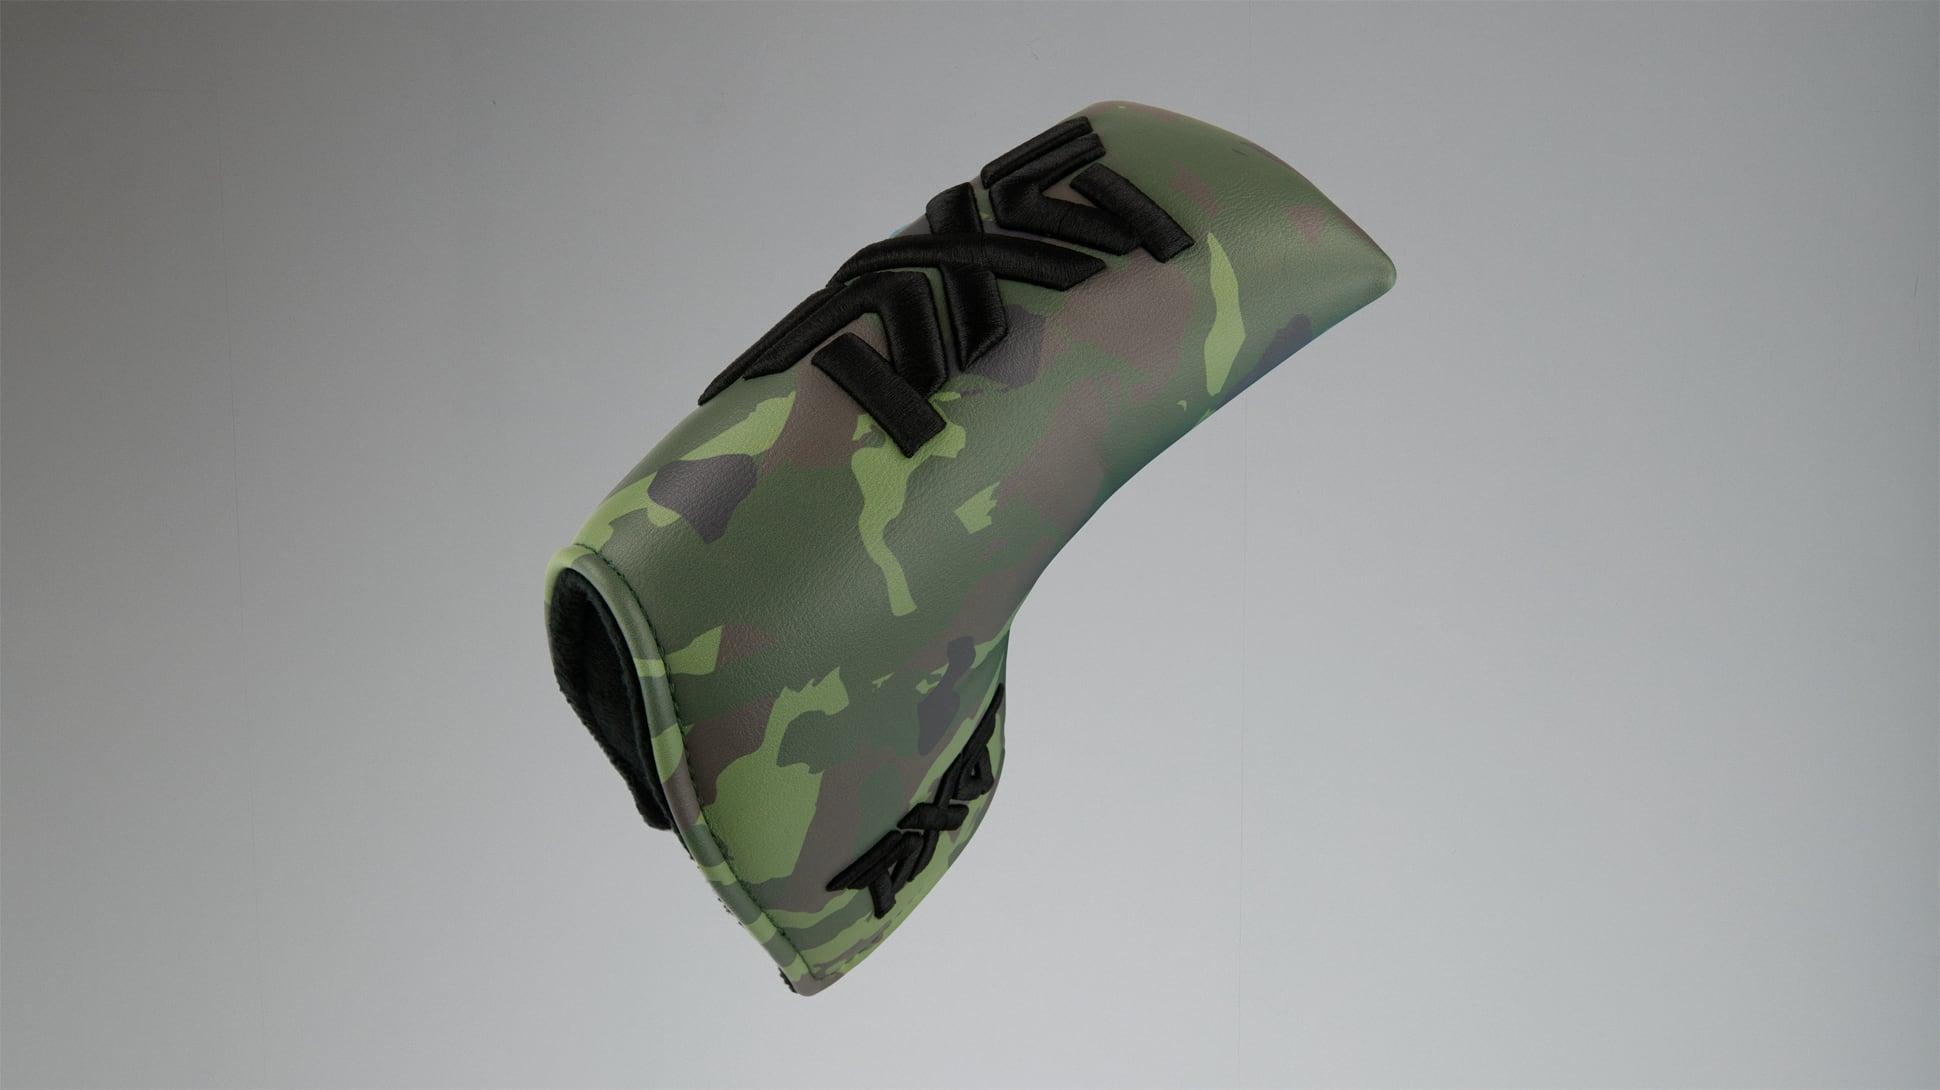 Jungle Camo Standard Blade Putter Headcover Image 1